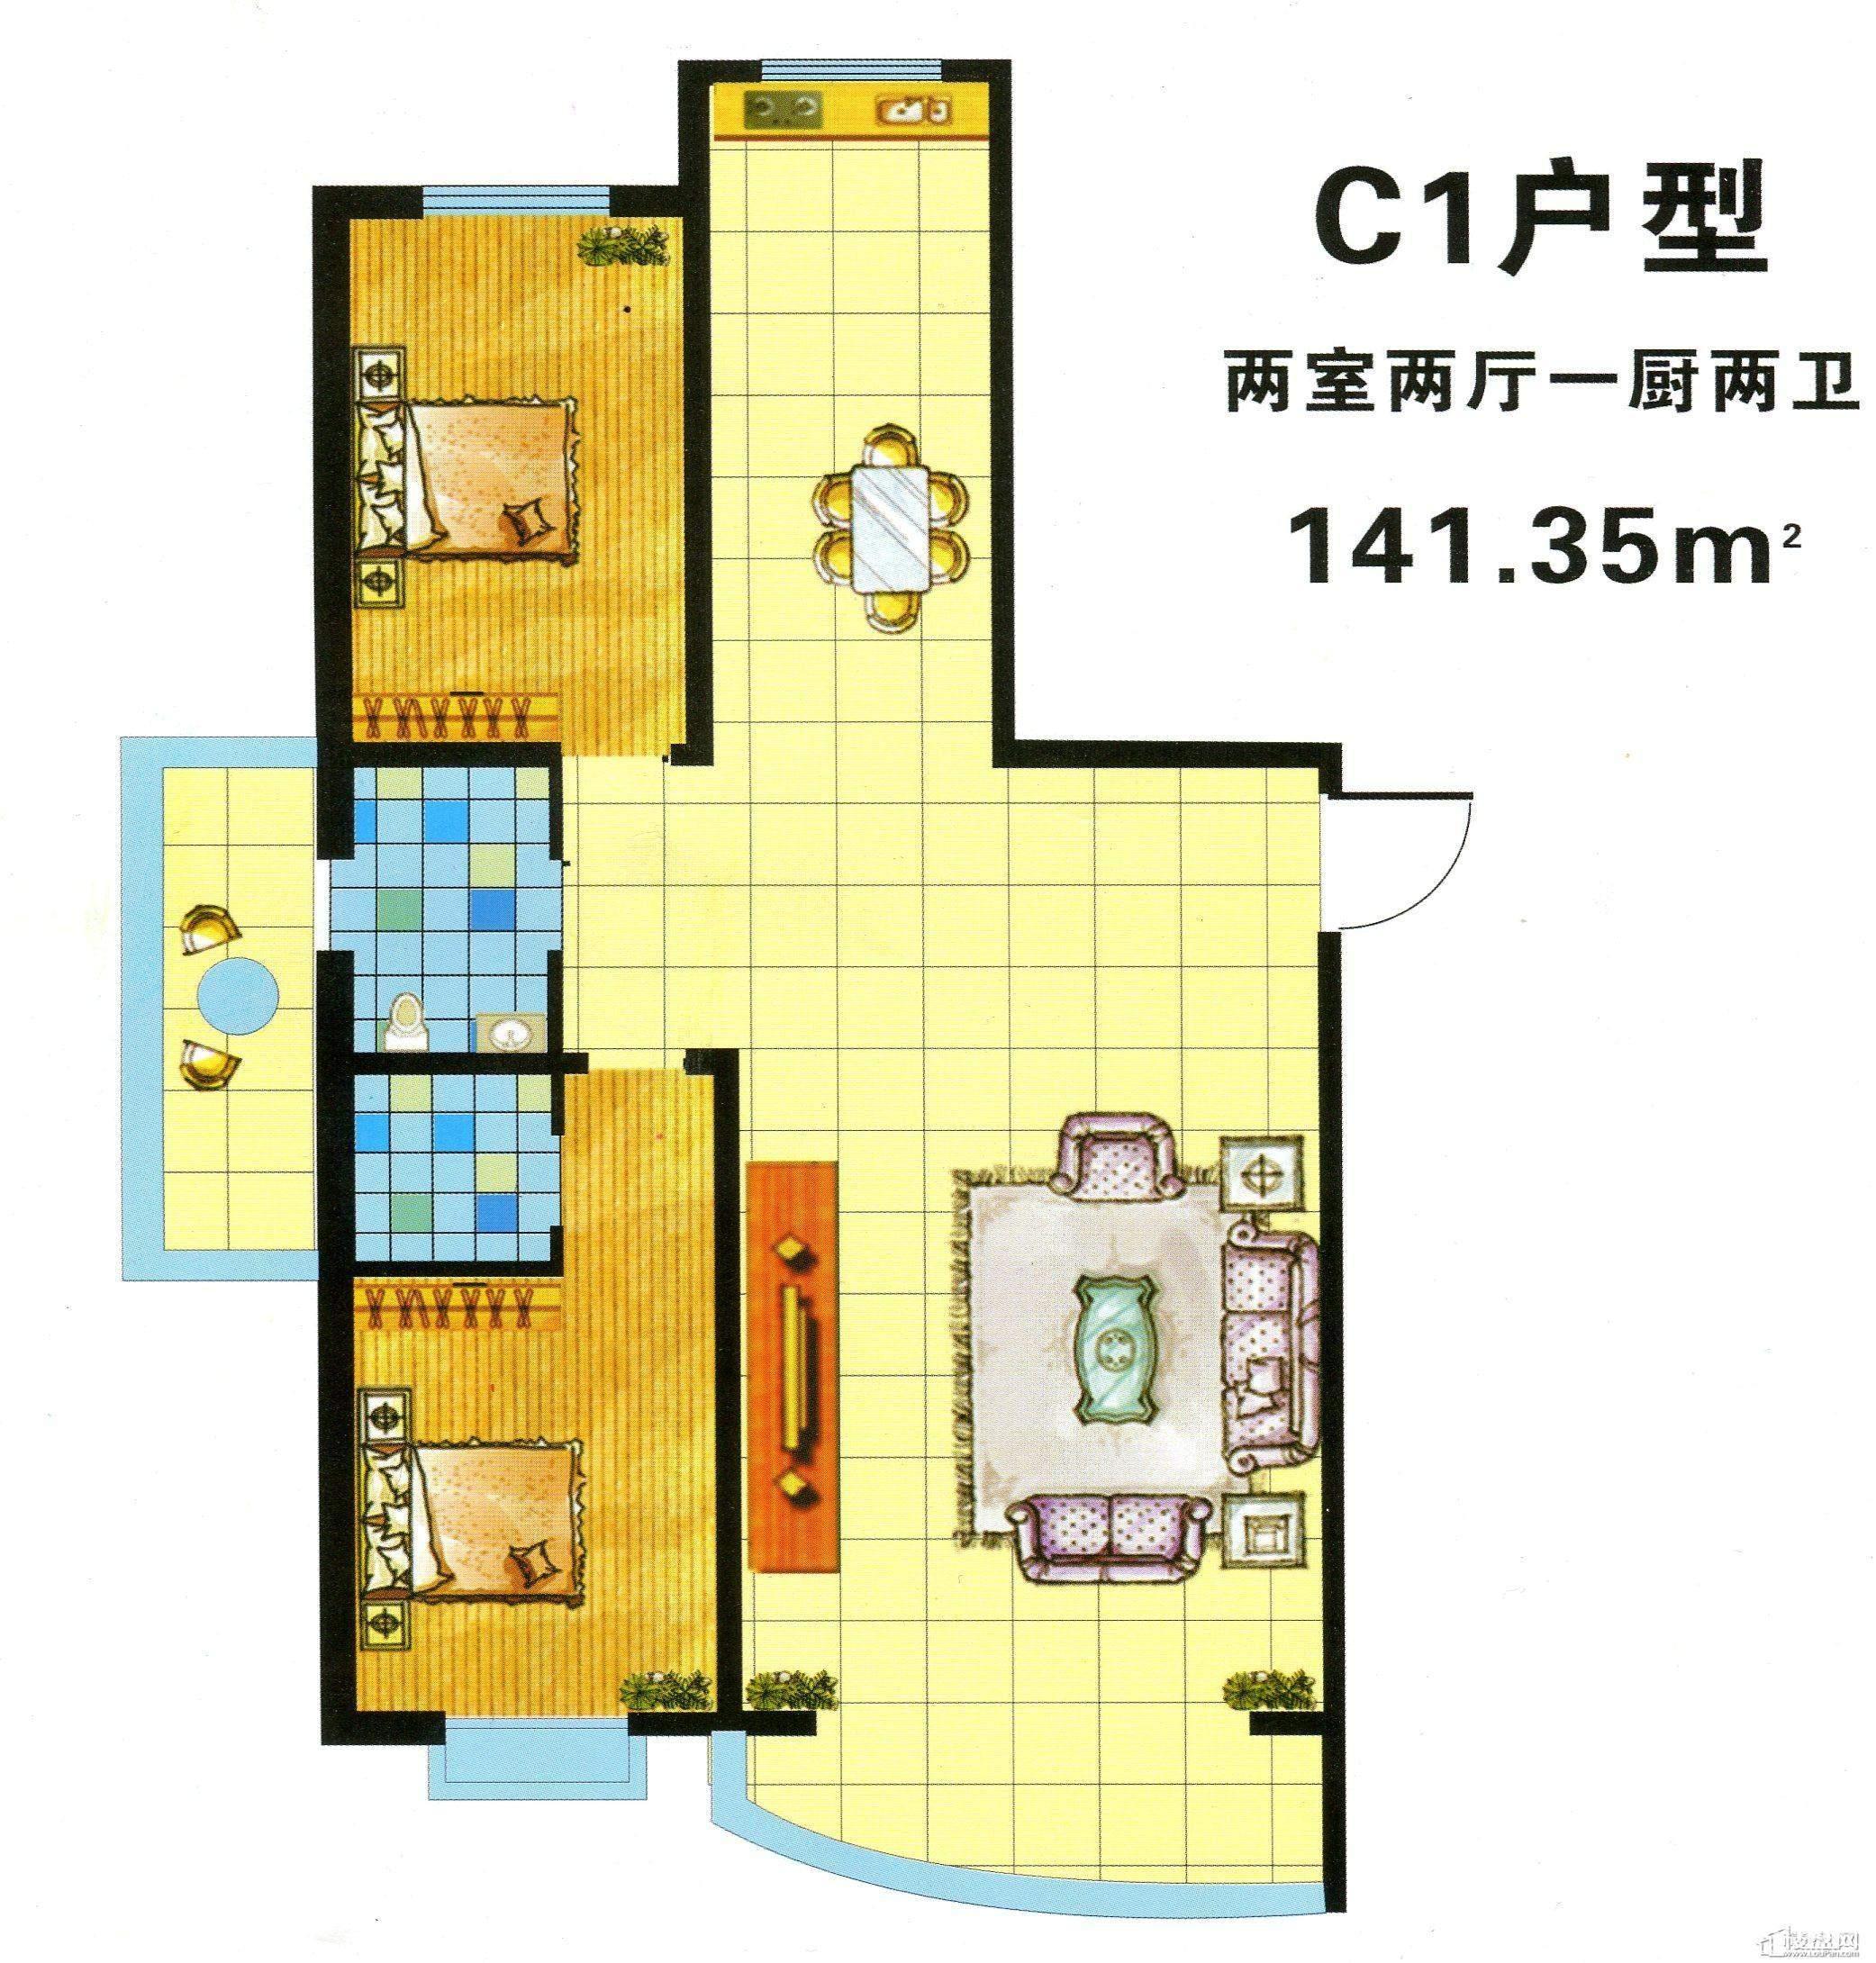 To 36M 1 141 厅 1 卫 面积 125 53m 2 户型 2 室 2 厅 1 卫  #B68F15 2083x2180